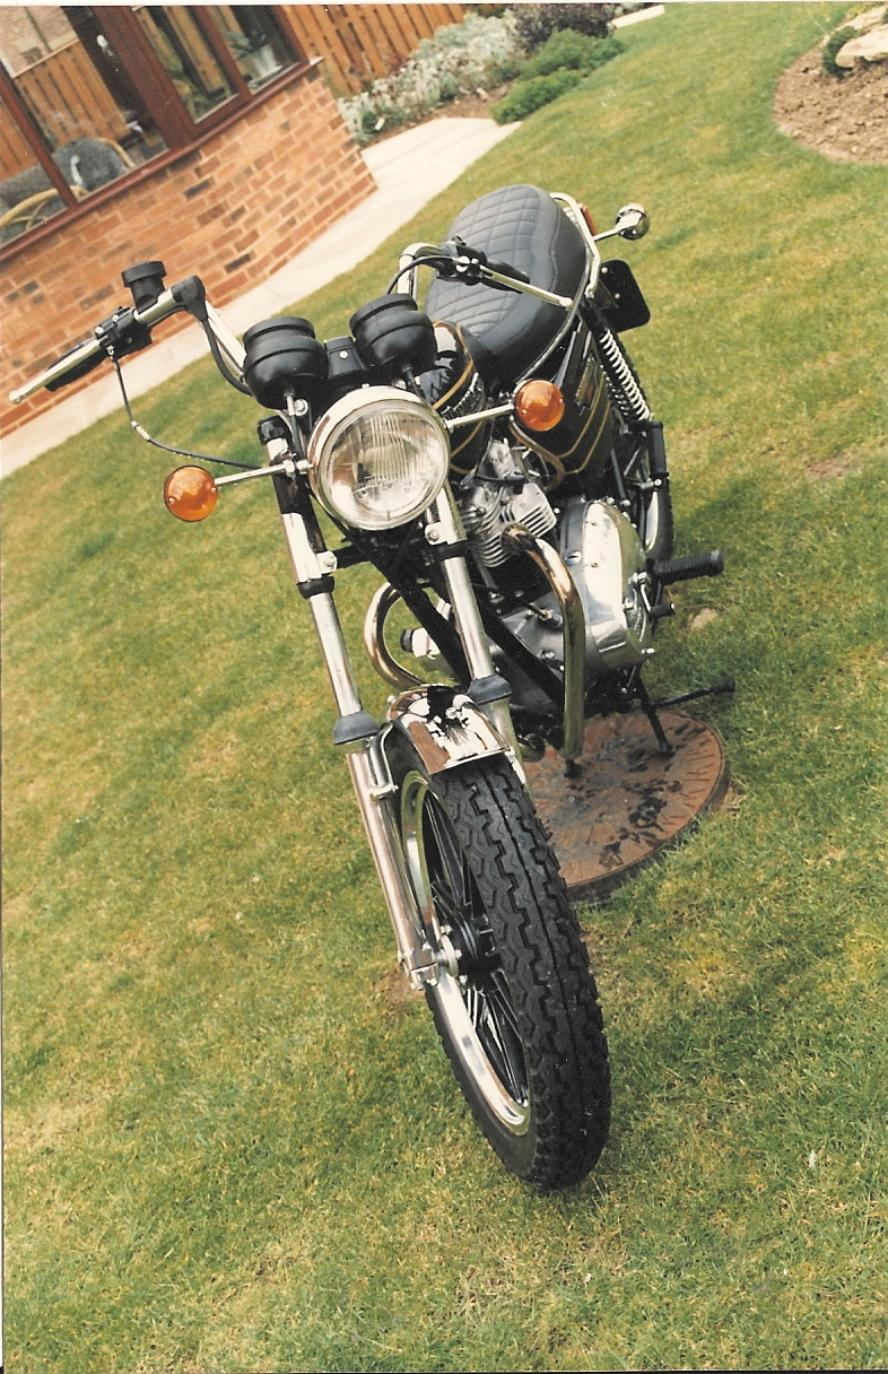 1974 dodge challenger dart charger coronet polara monaco service shop manual set chassis service manual body service manual wiring diagrams manual and the wiring diagrams training manual very rare book